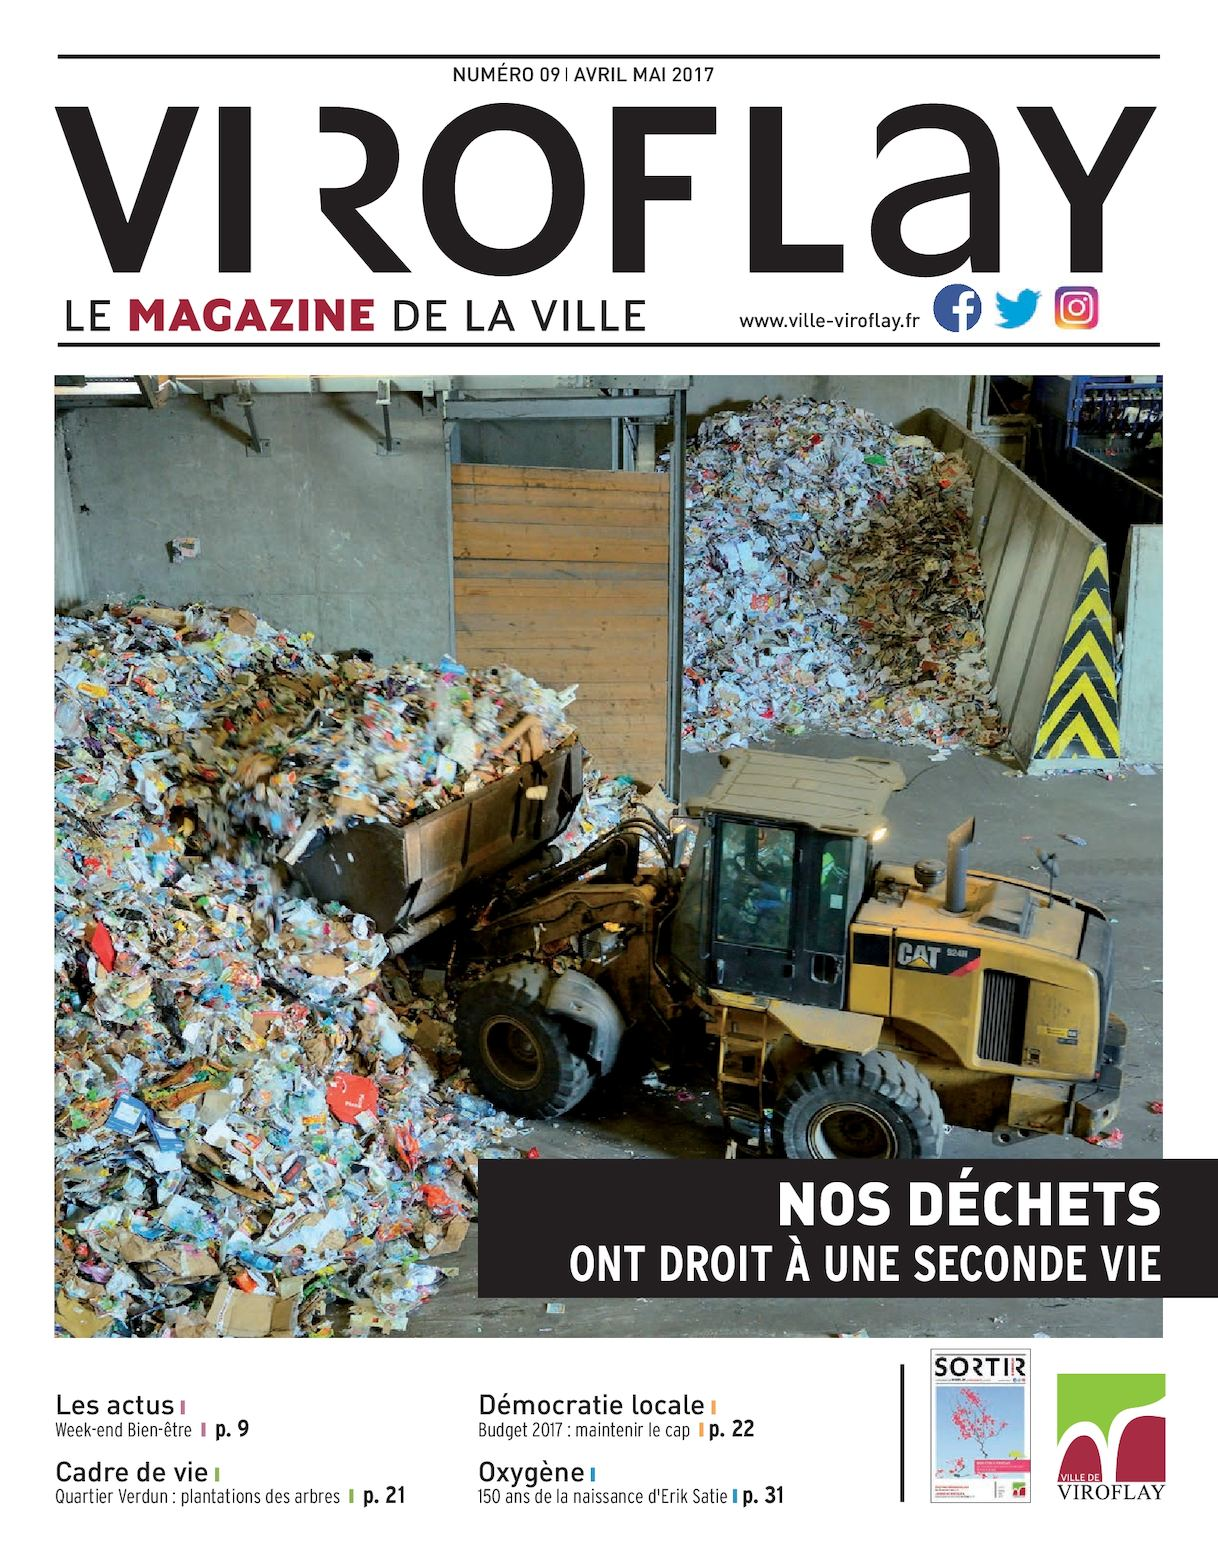 Viroflay le magazine de la ville n°9 (avril - mai 2017)